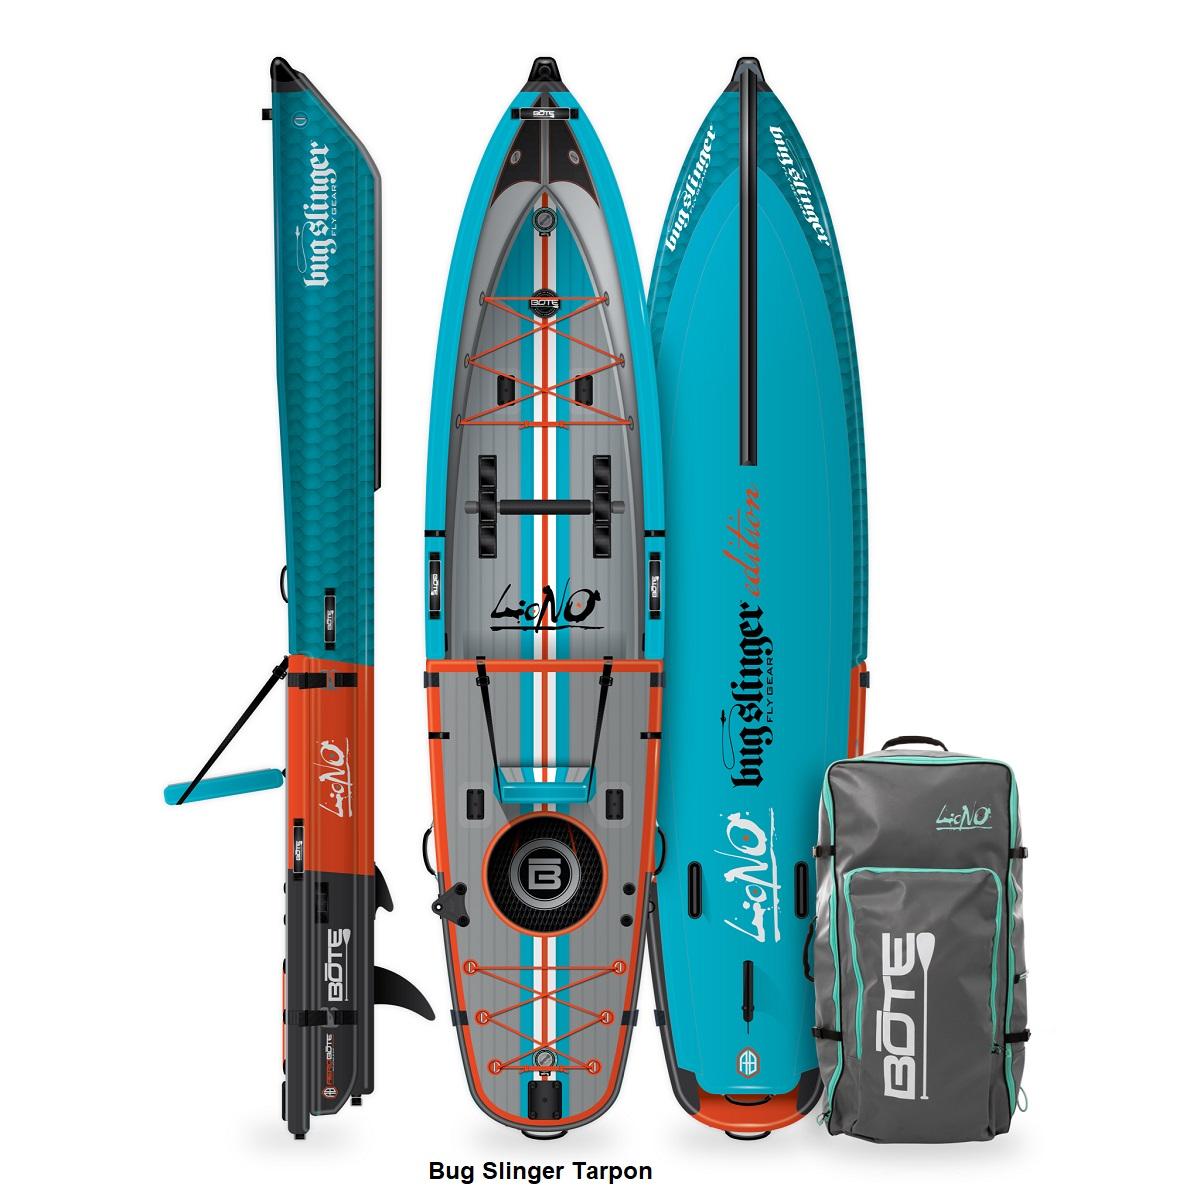 BOTE Lono Inflatable Kayak - Bug Slinger Tarpon